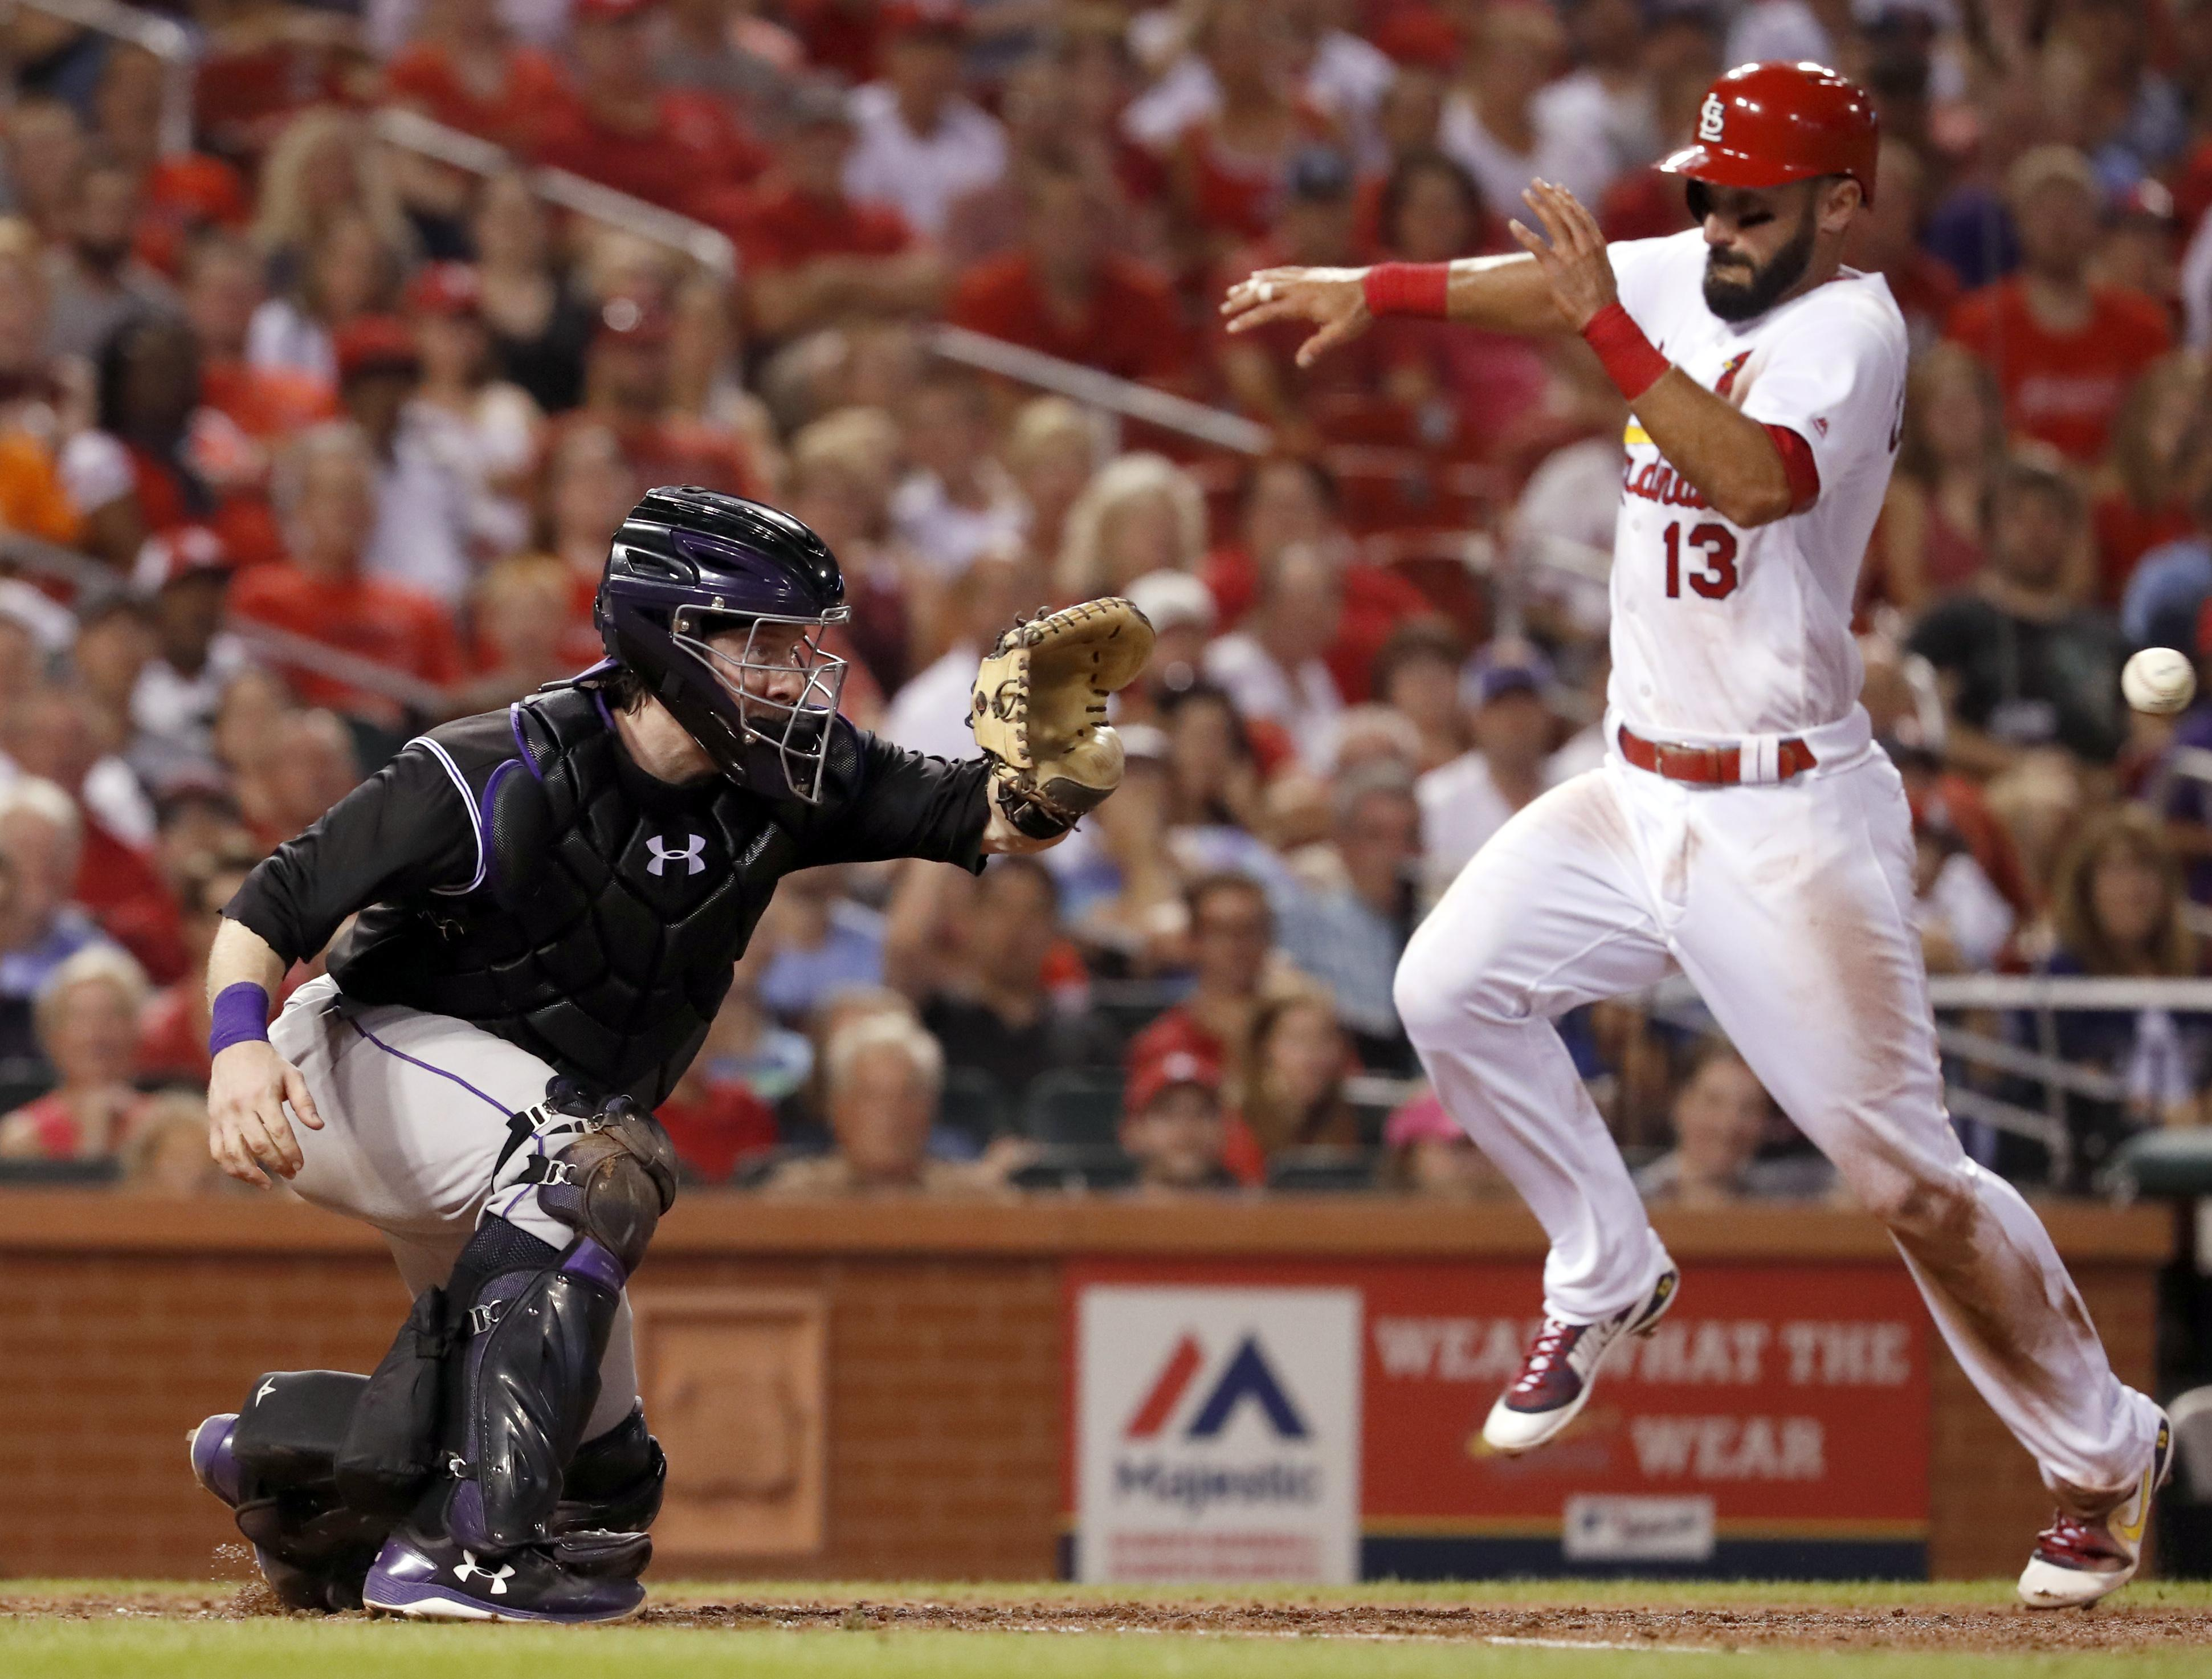 Rockies_cardinals_baseball_56307